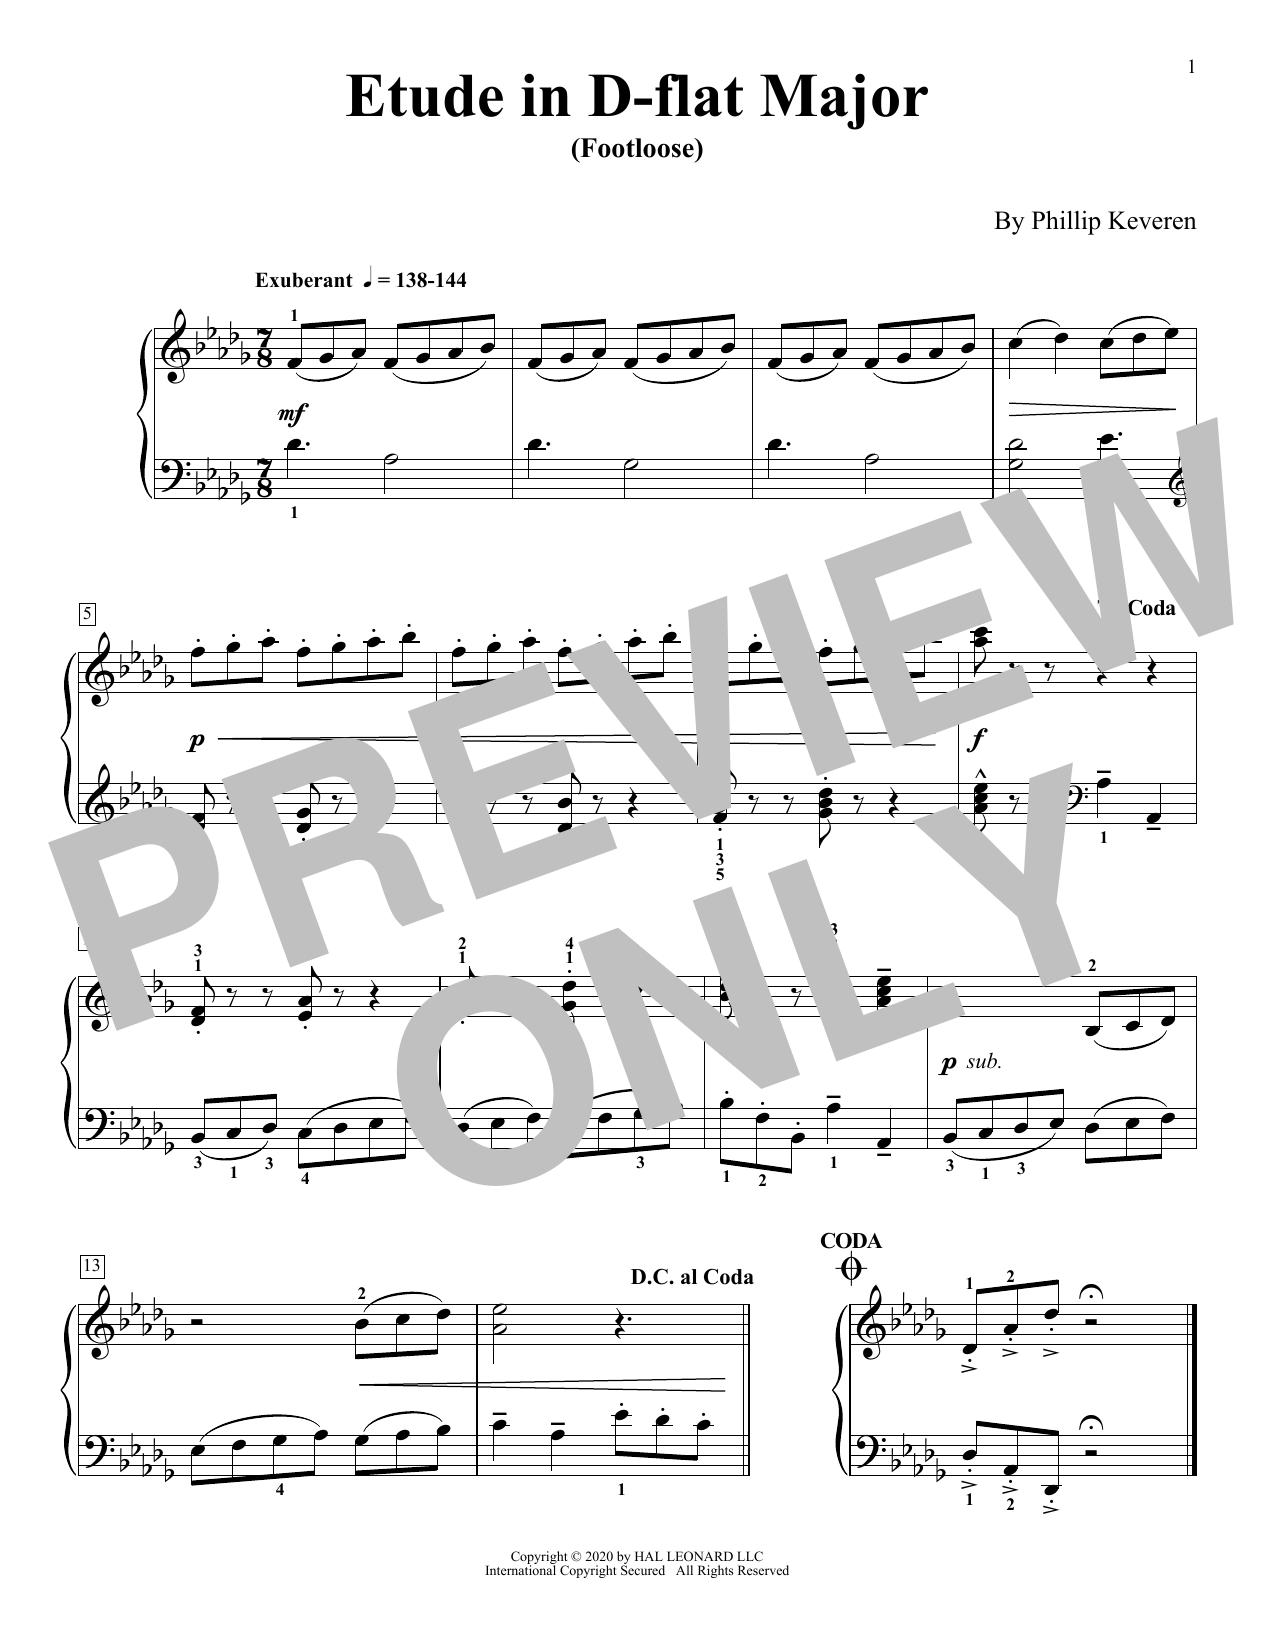 Etude In D-Flat Major (Footloose) (Piano Solo)